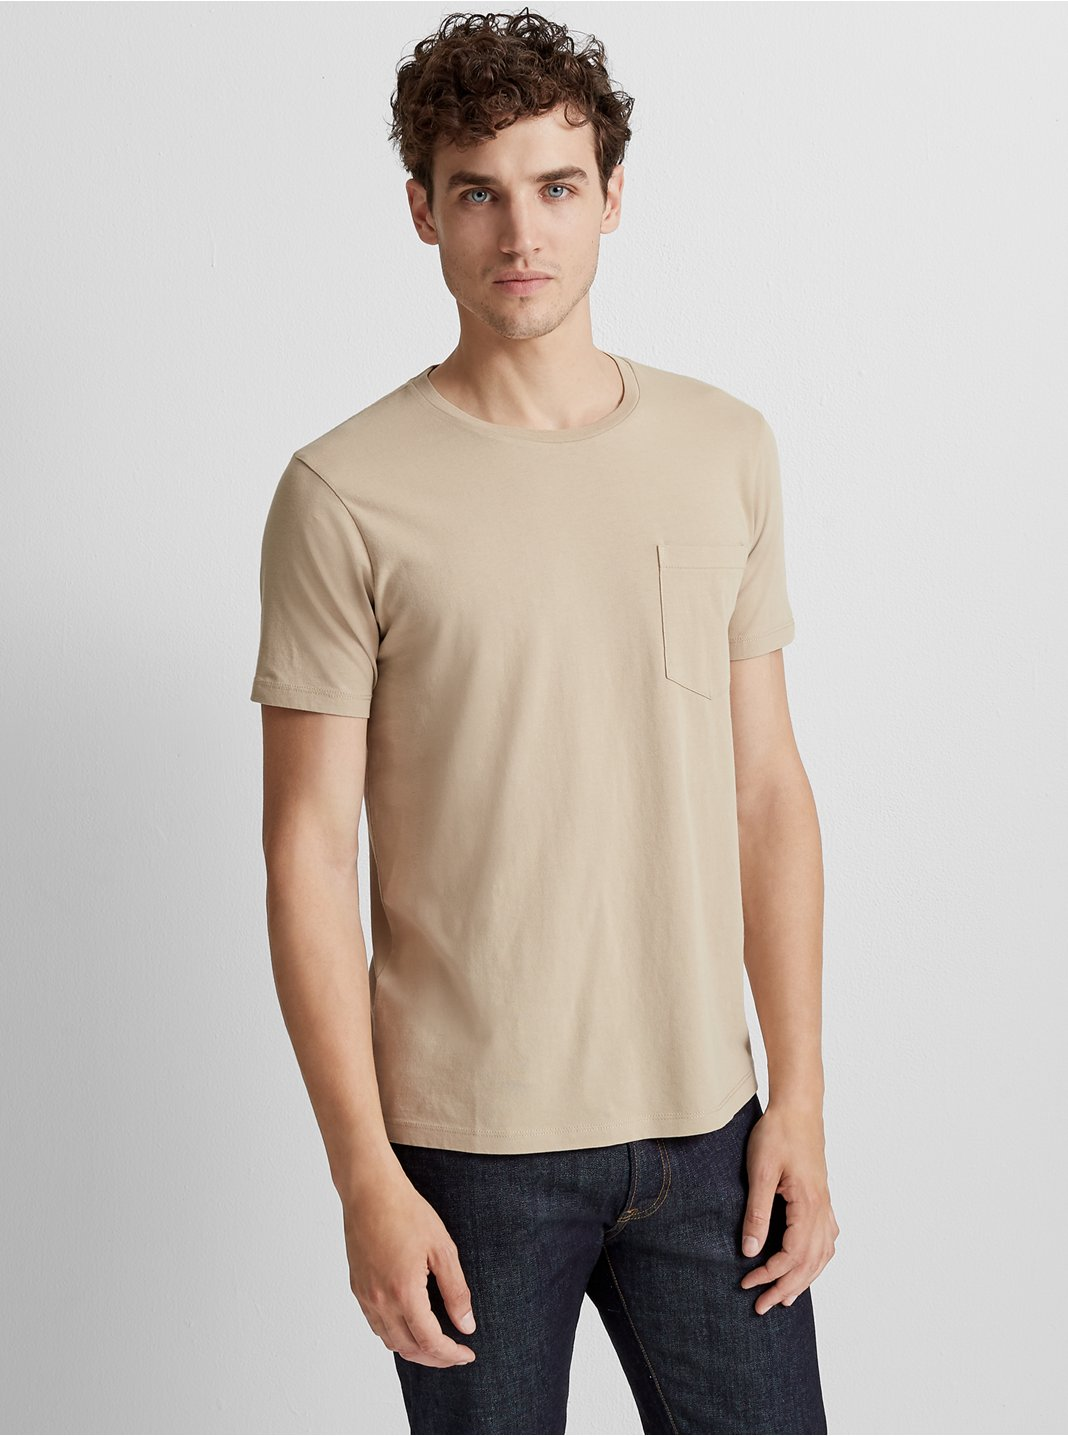 Williams Garment-Dyed Crew